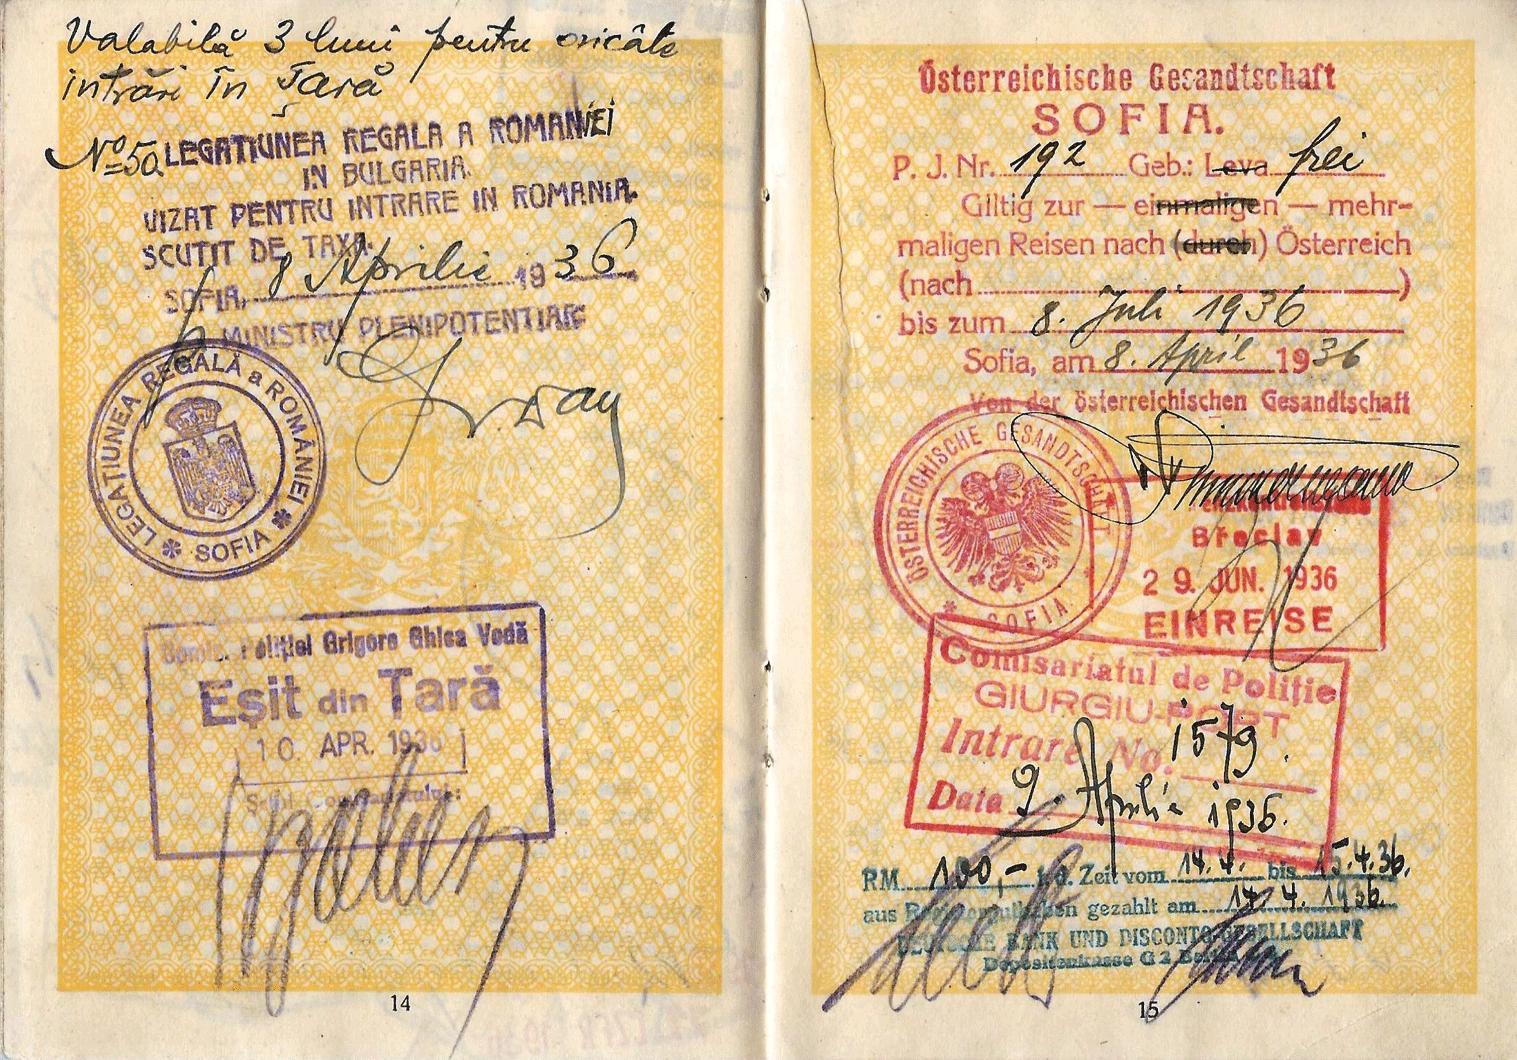 1938 Austrian visa